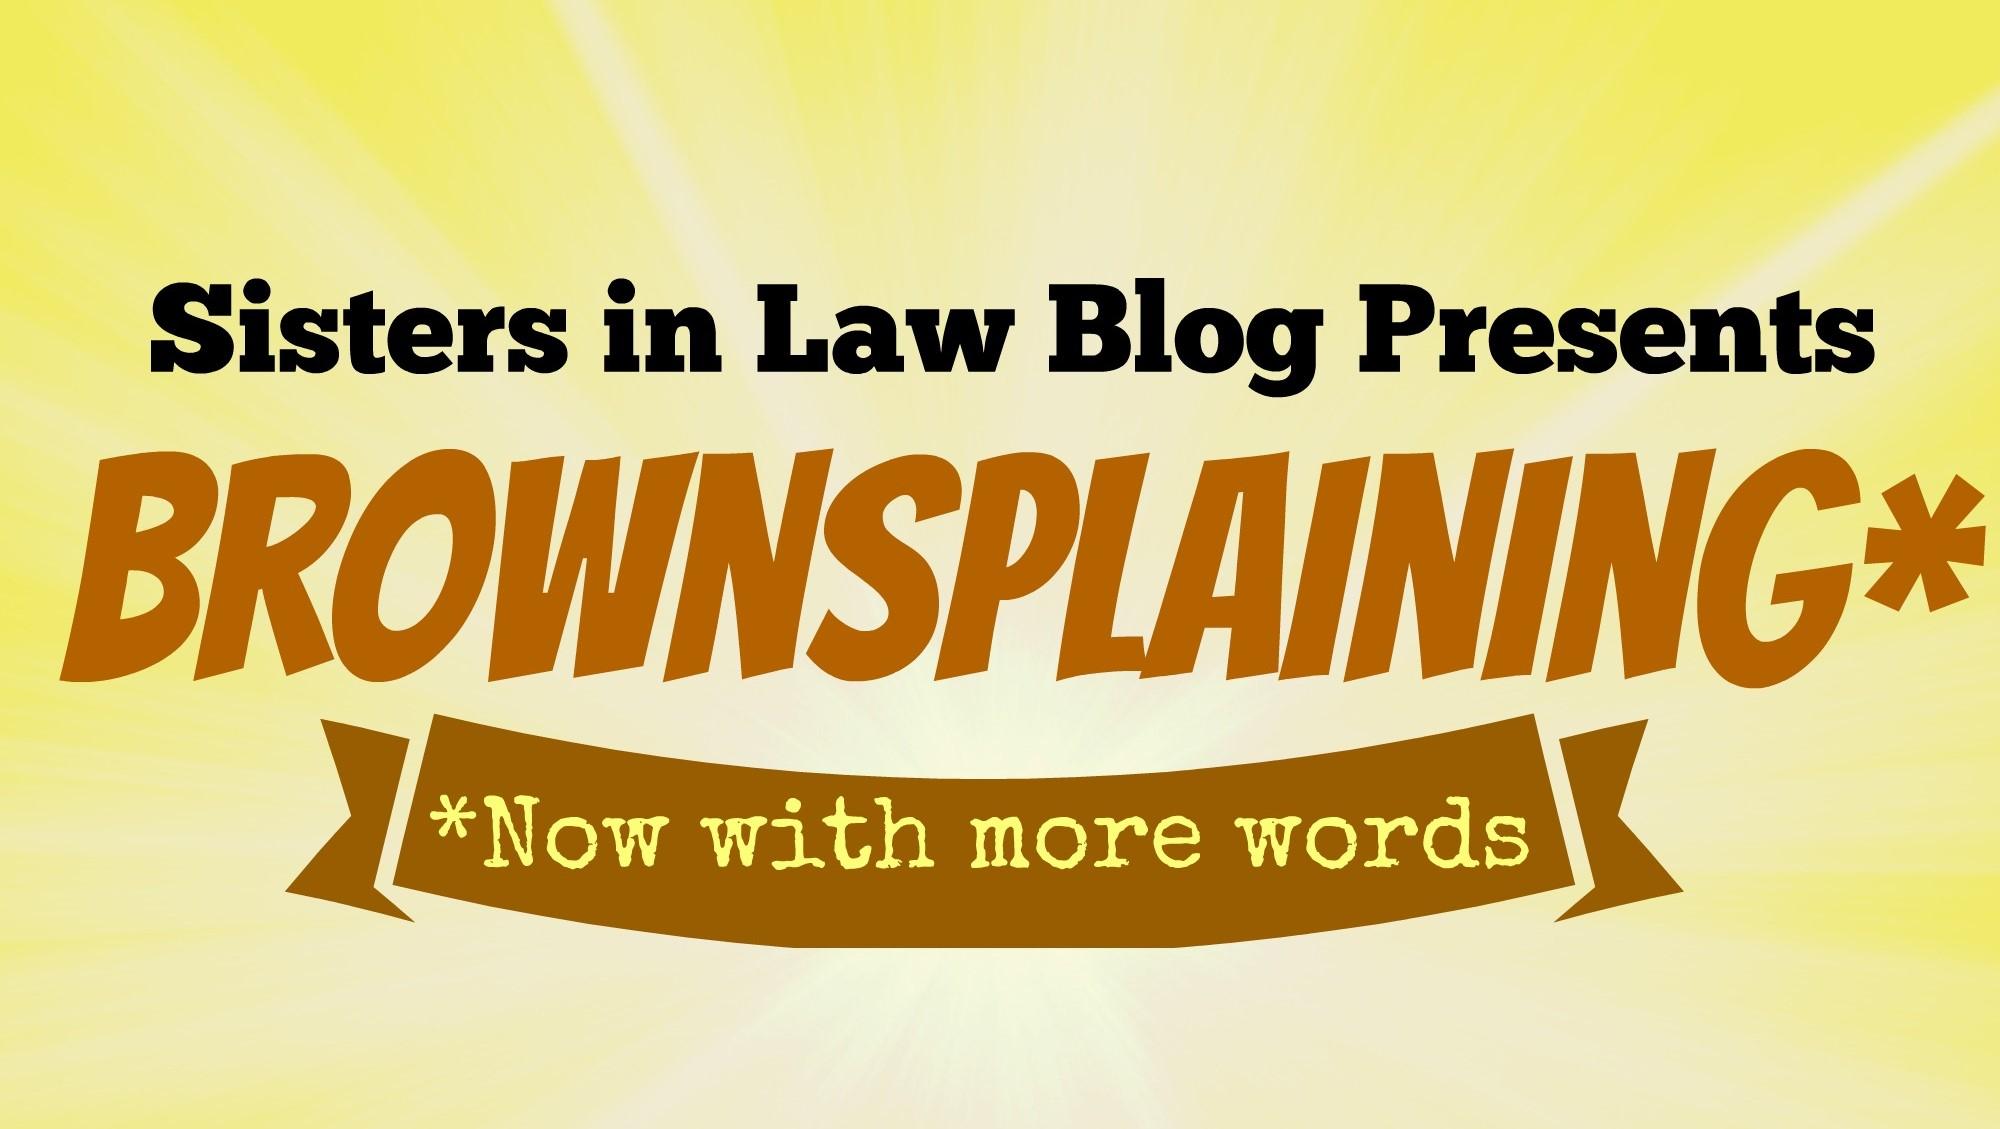 Brownsplaining title